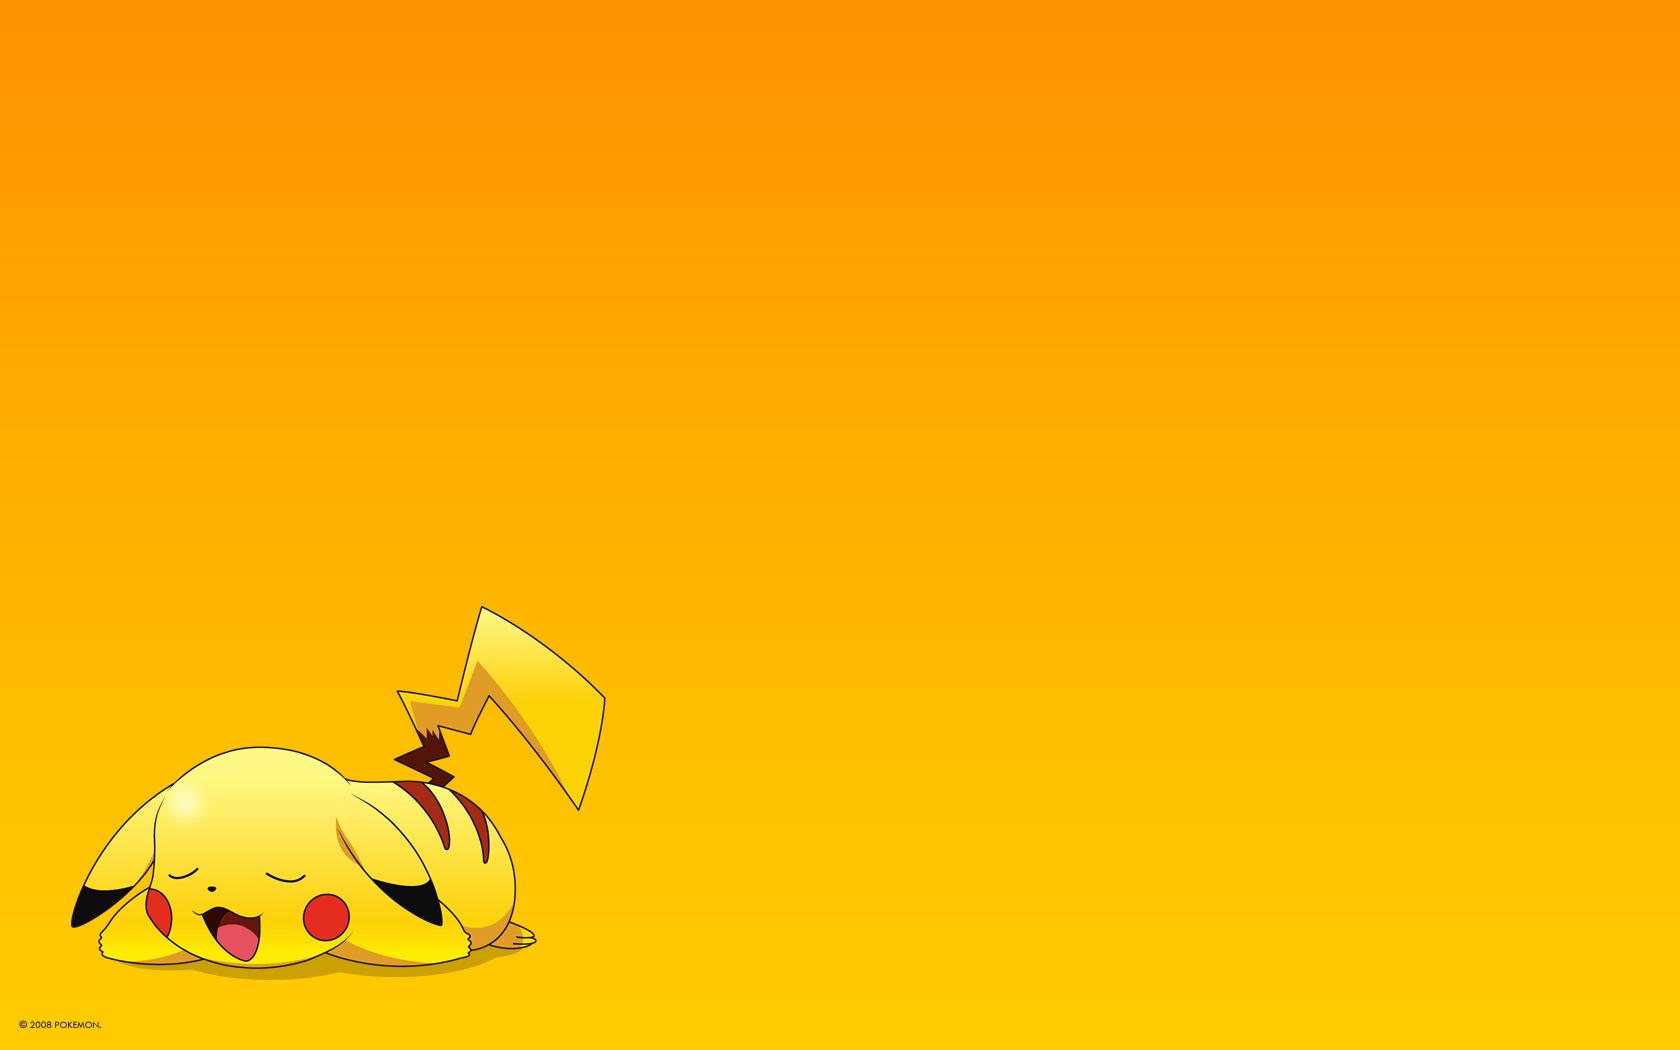 Pikachu Wallpaper   Pikachu Wallpaper 24422765 1680x1050